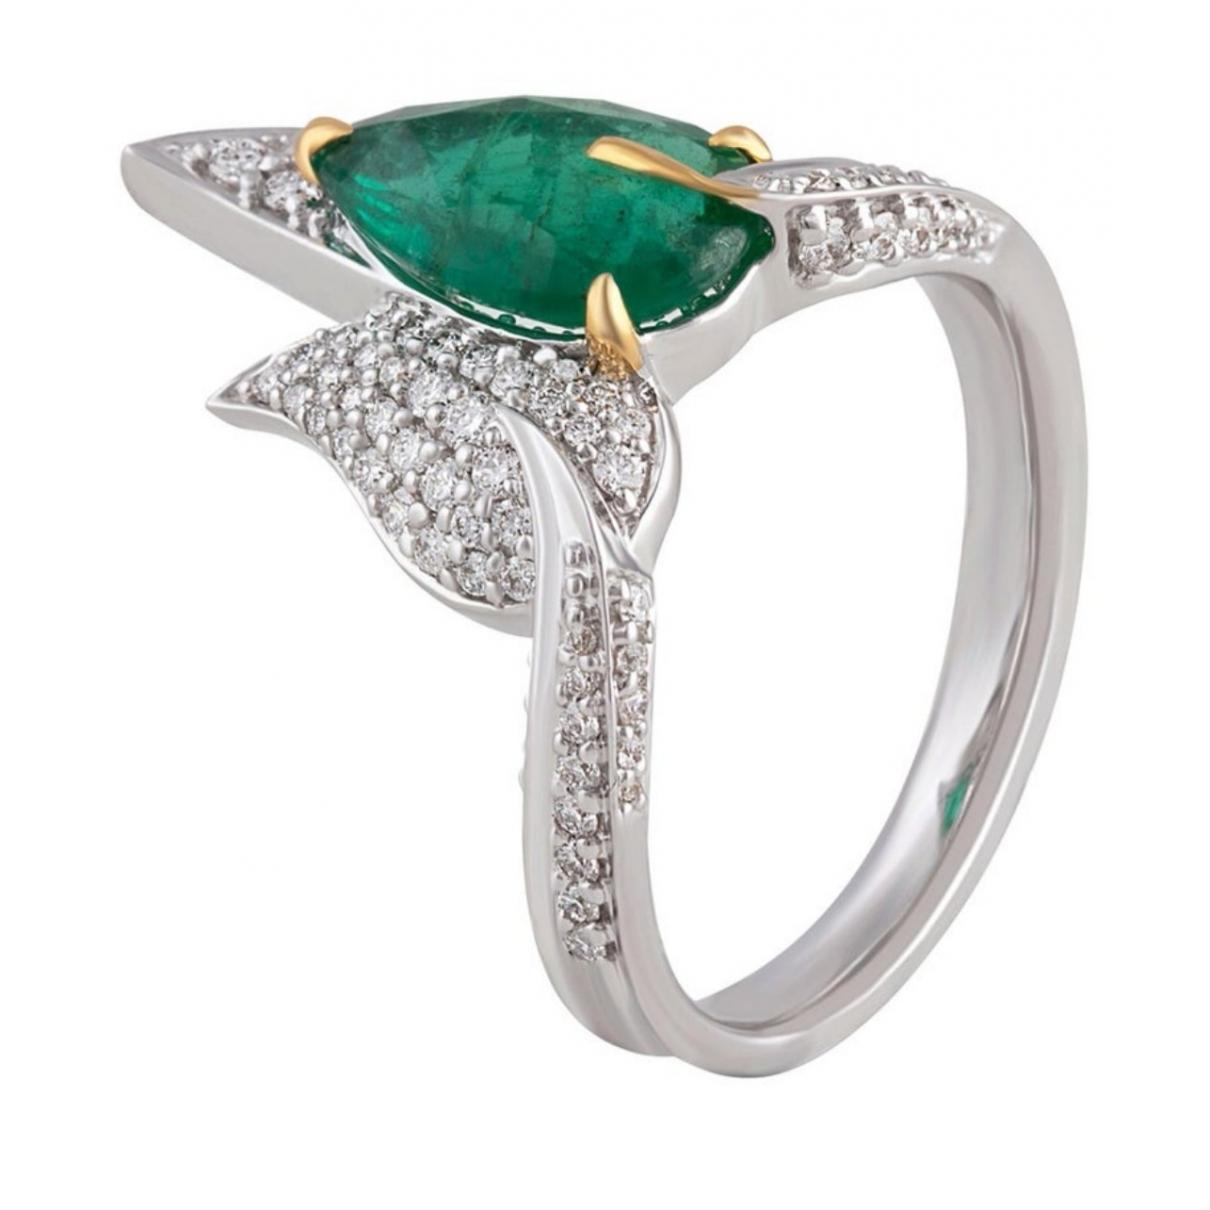 - Bague Emeraude pour femme en or blanc - vert